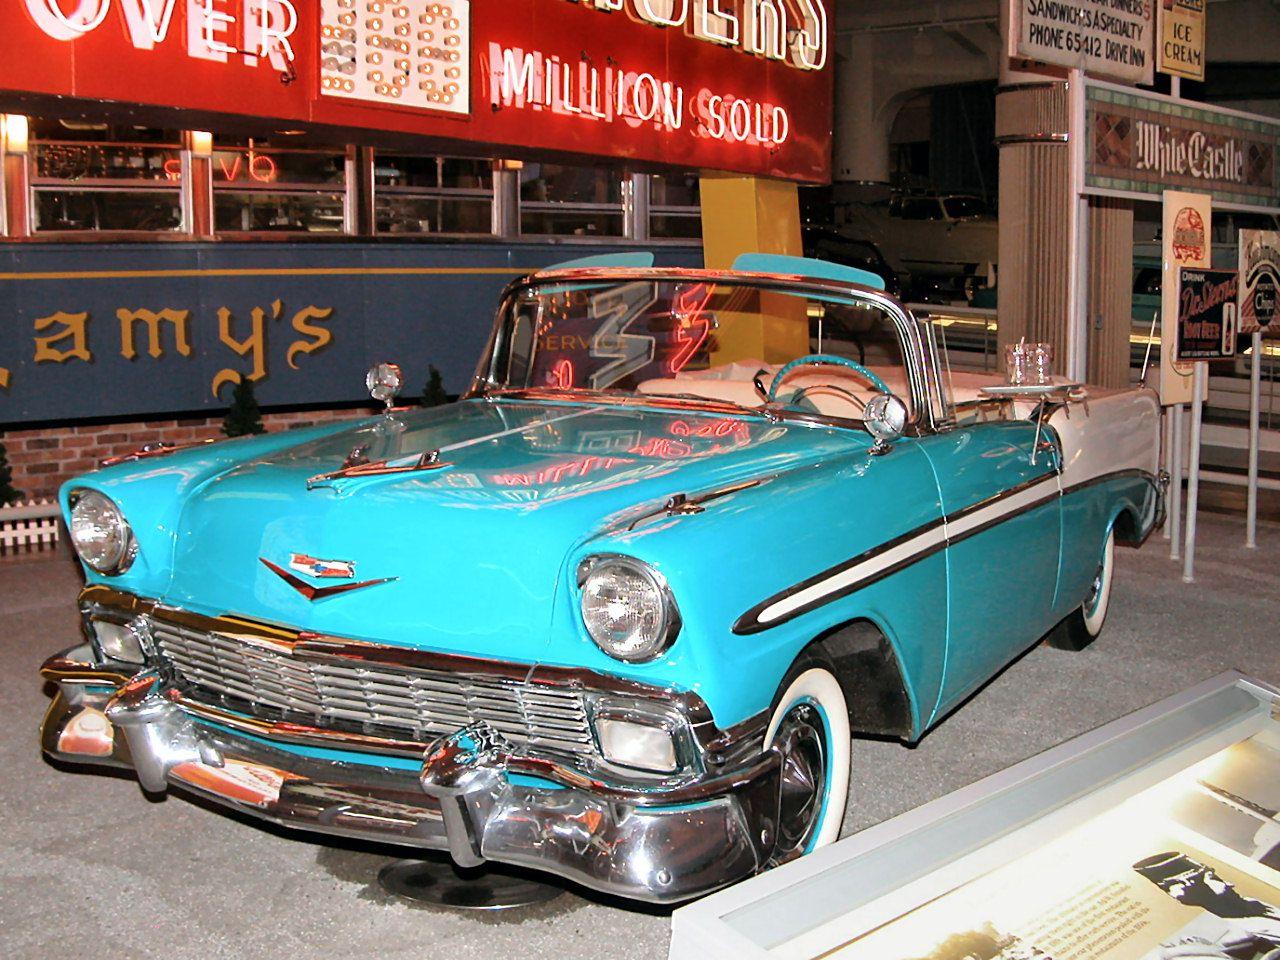 1956 Chevrolet Bel Air Convertible Chevrolet Bel Air Chevrolet